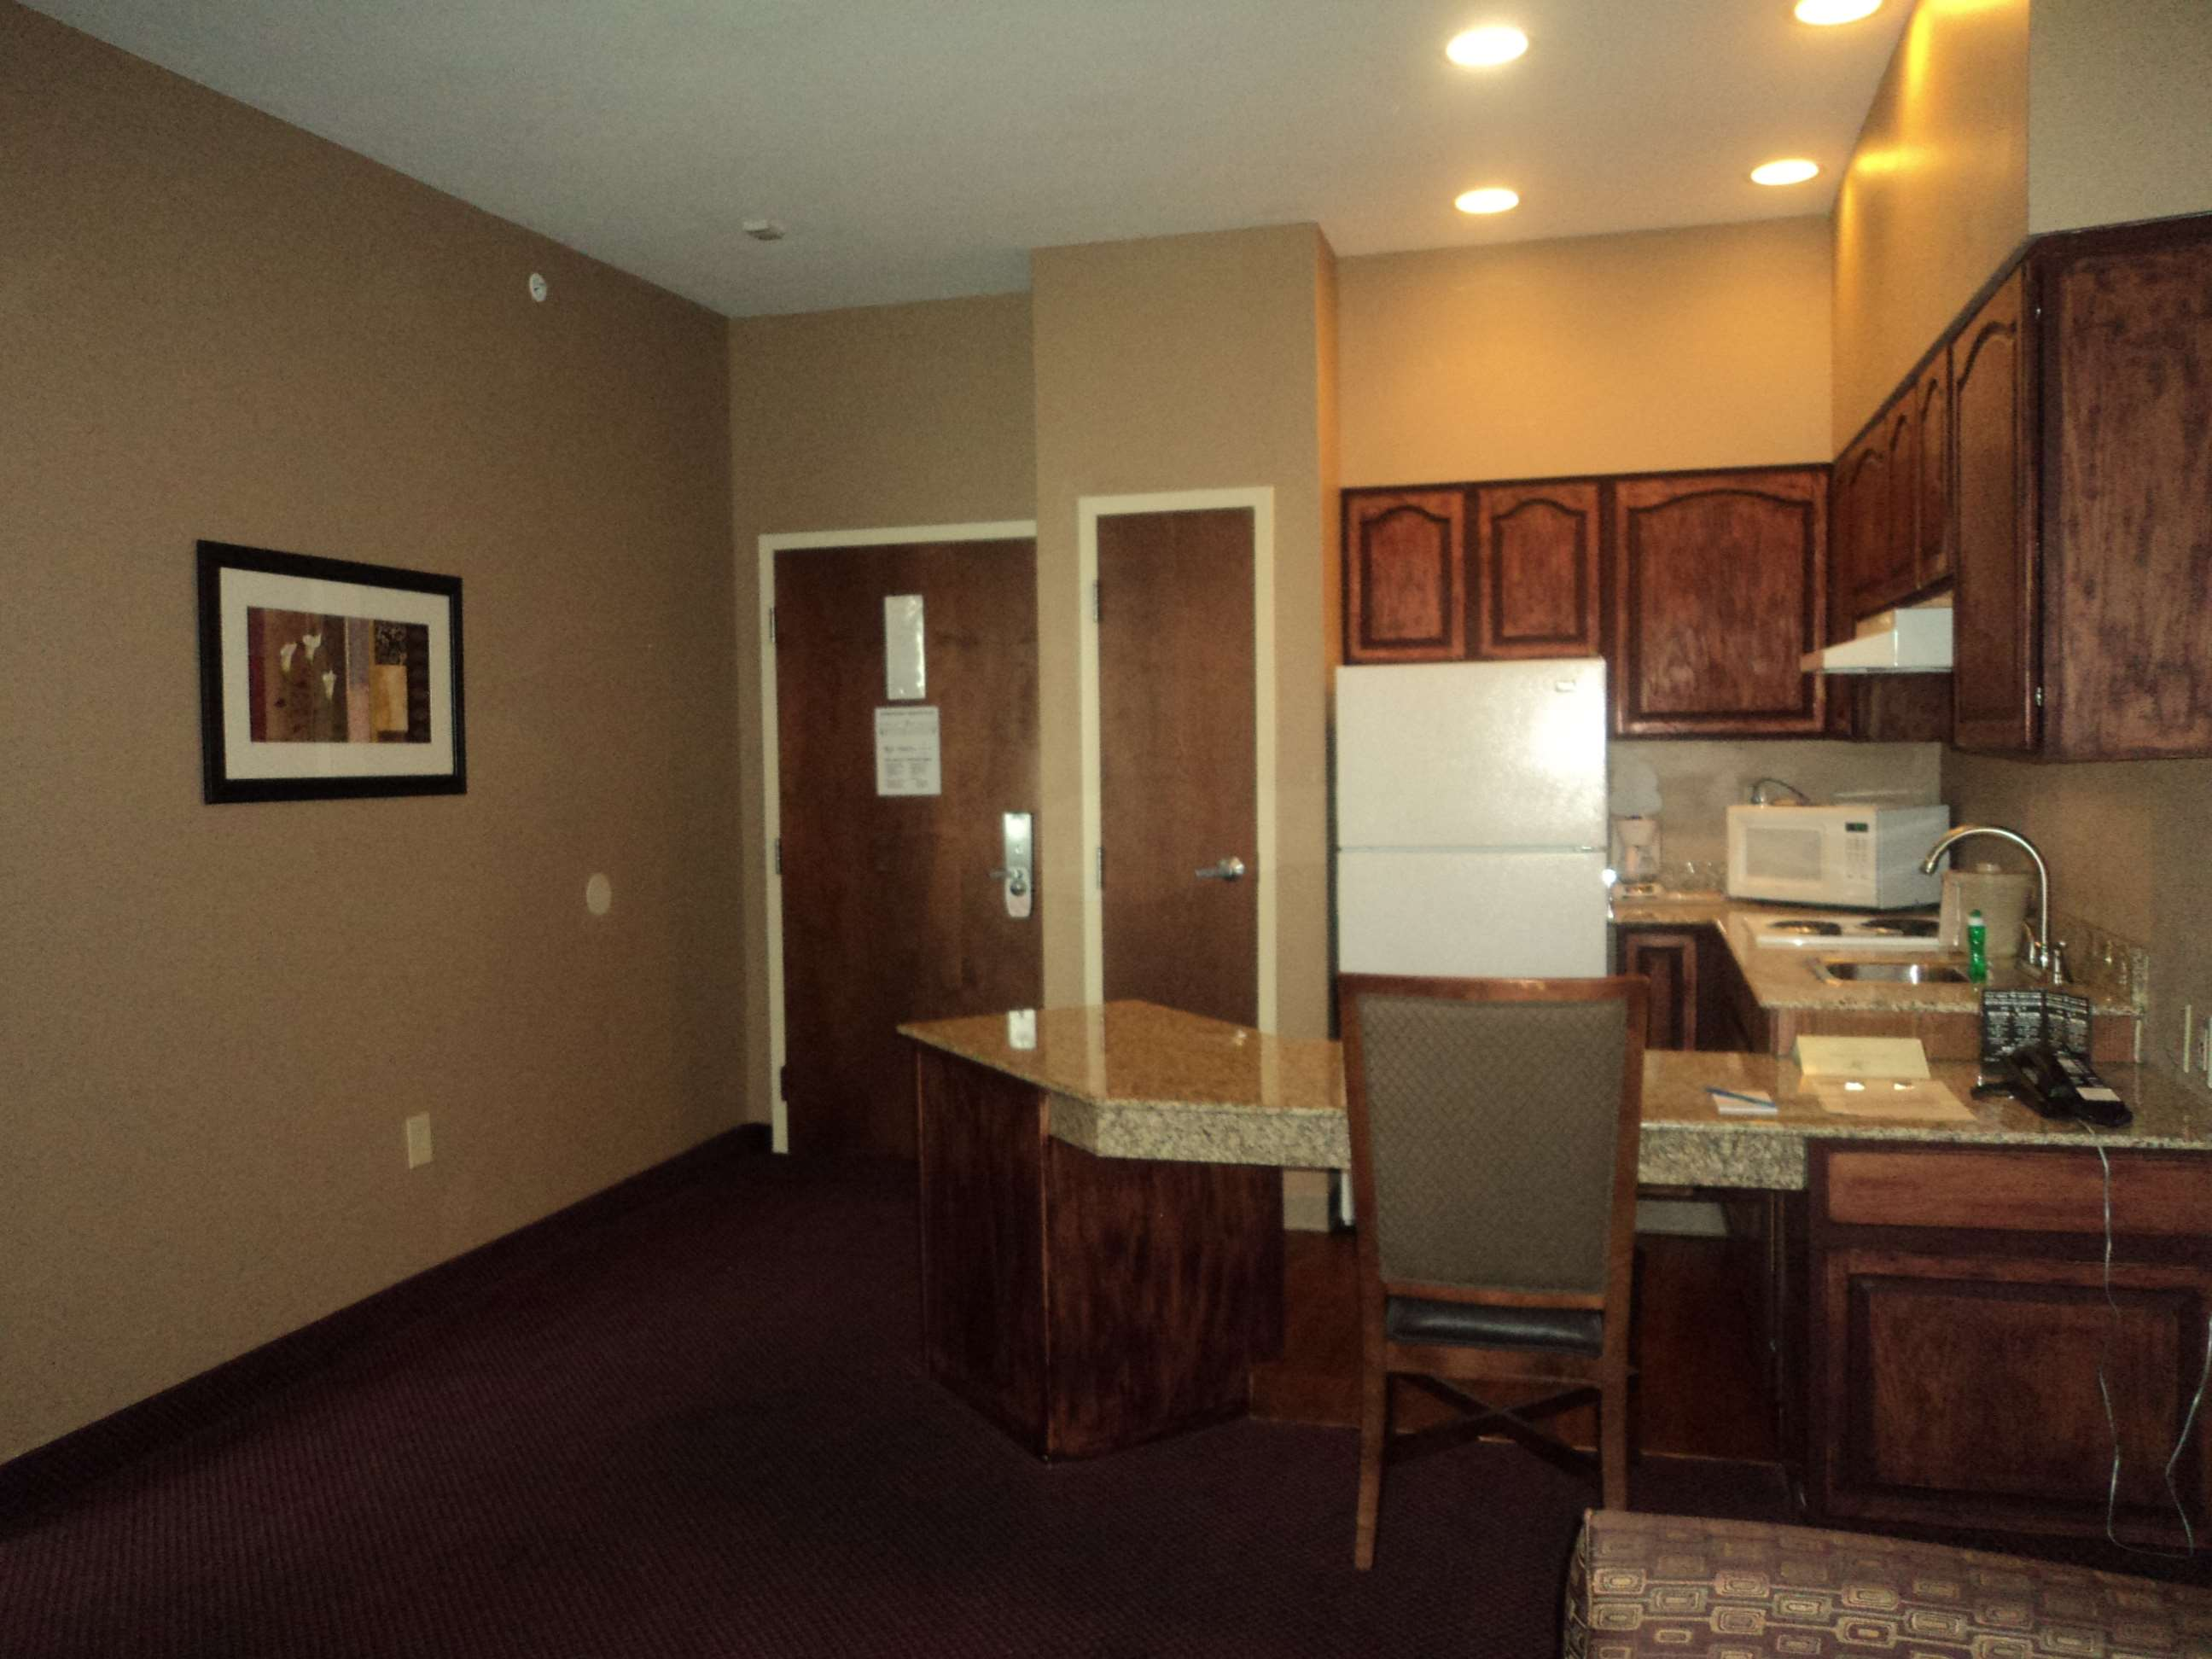 Best Western Plus Hannaford Inn & Suites image 20